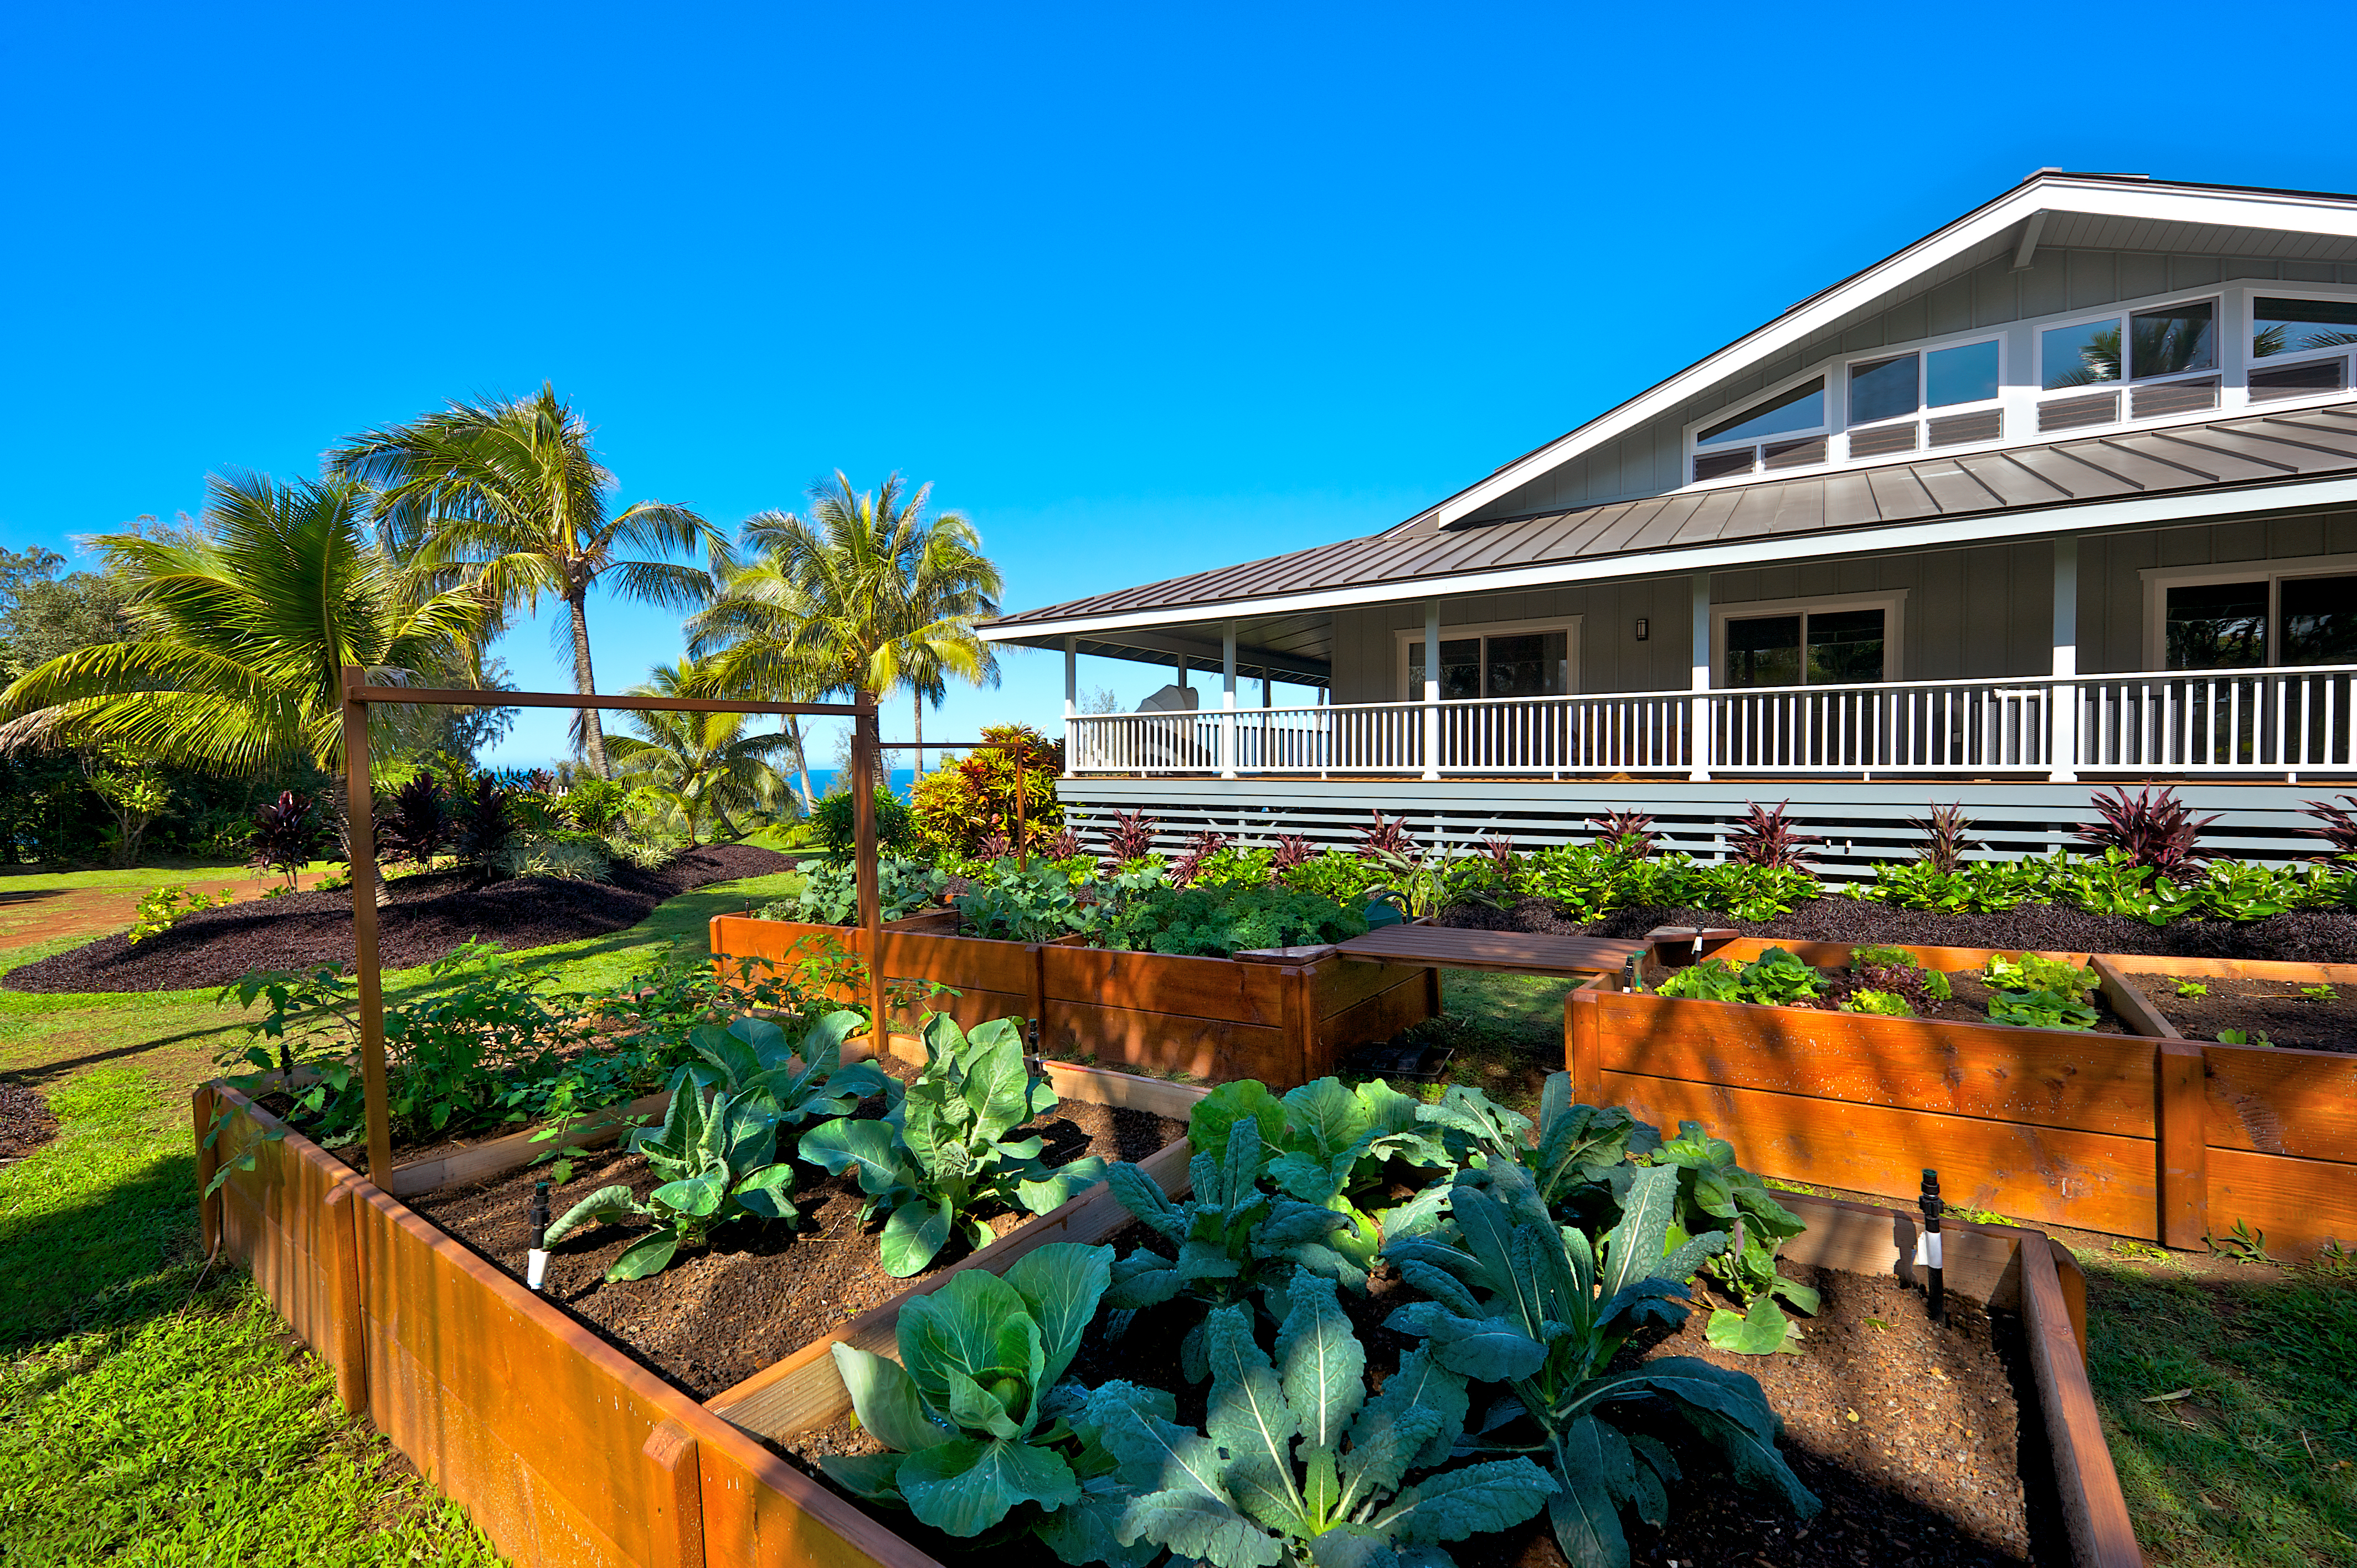 Outdoors 3 - Veggie Garden